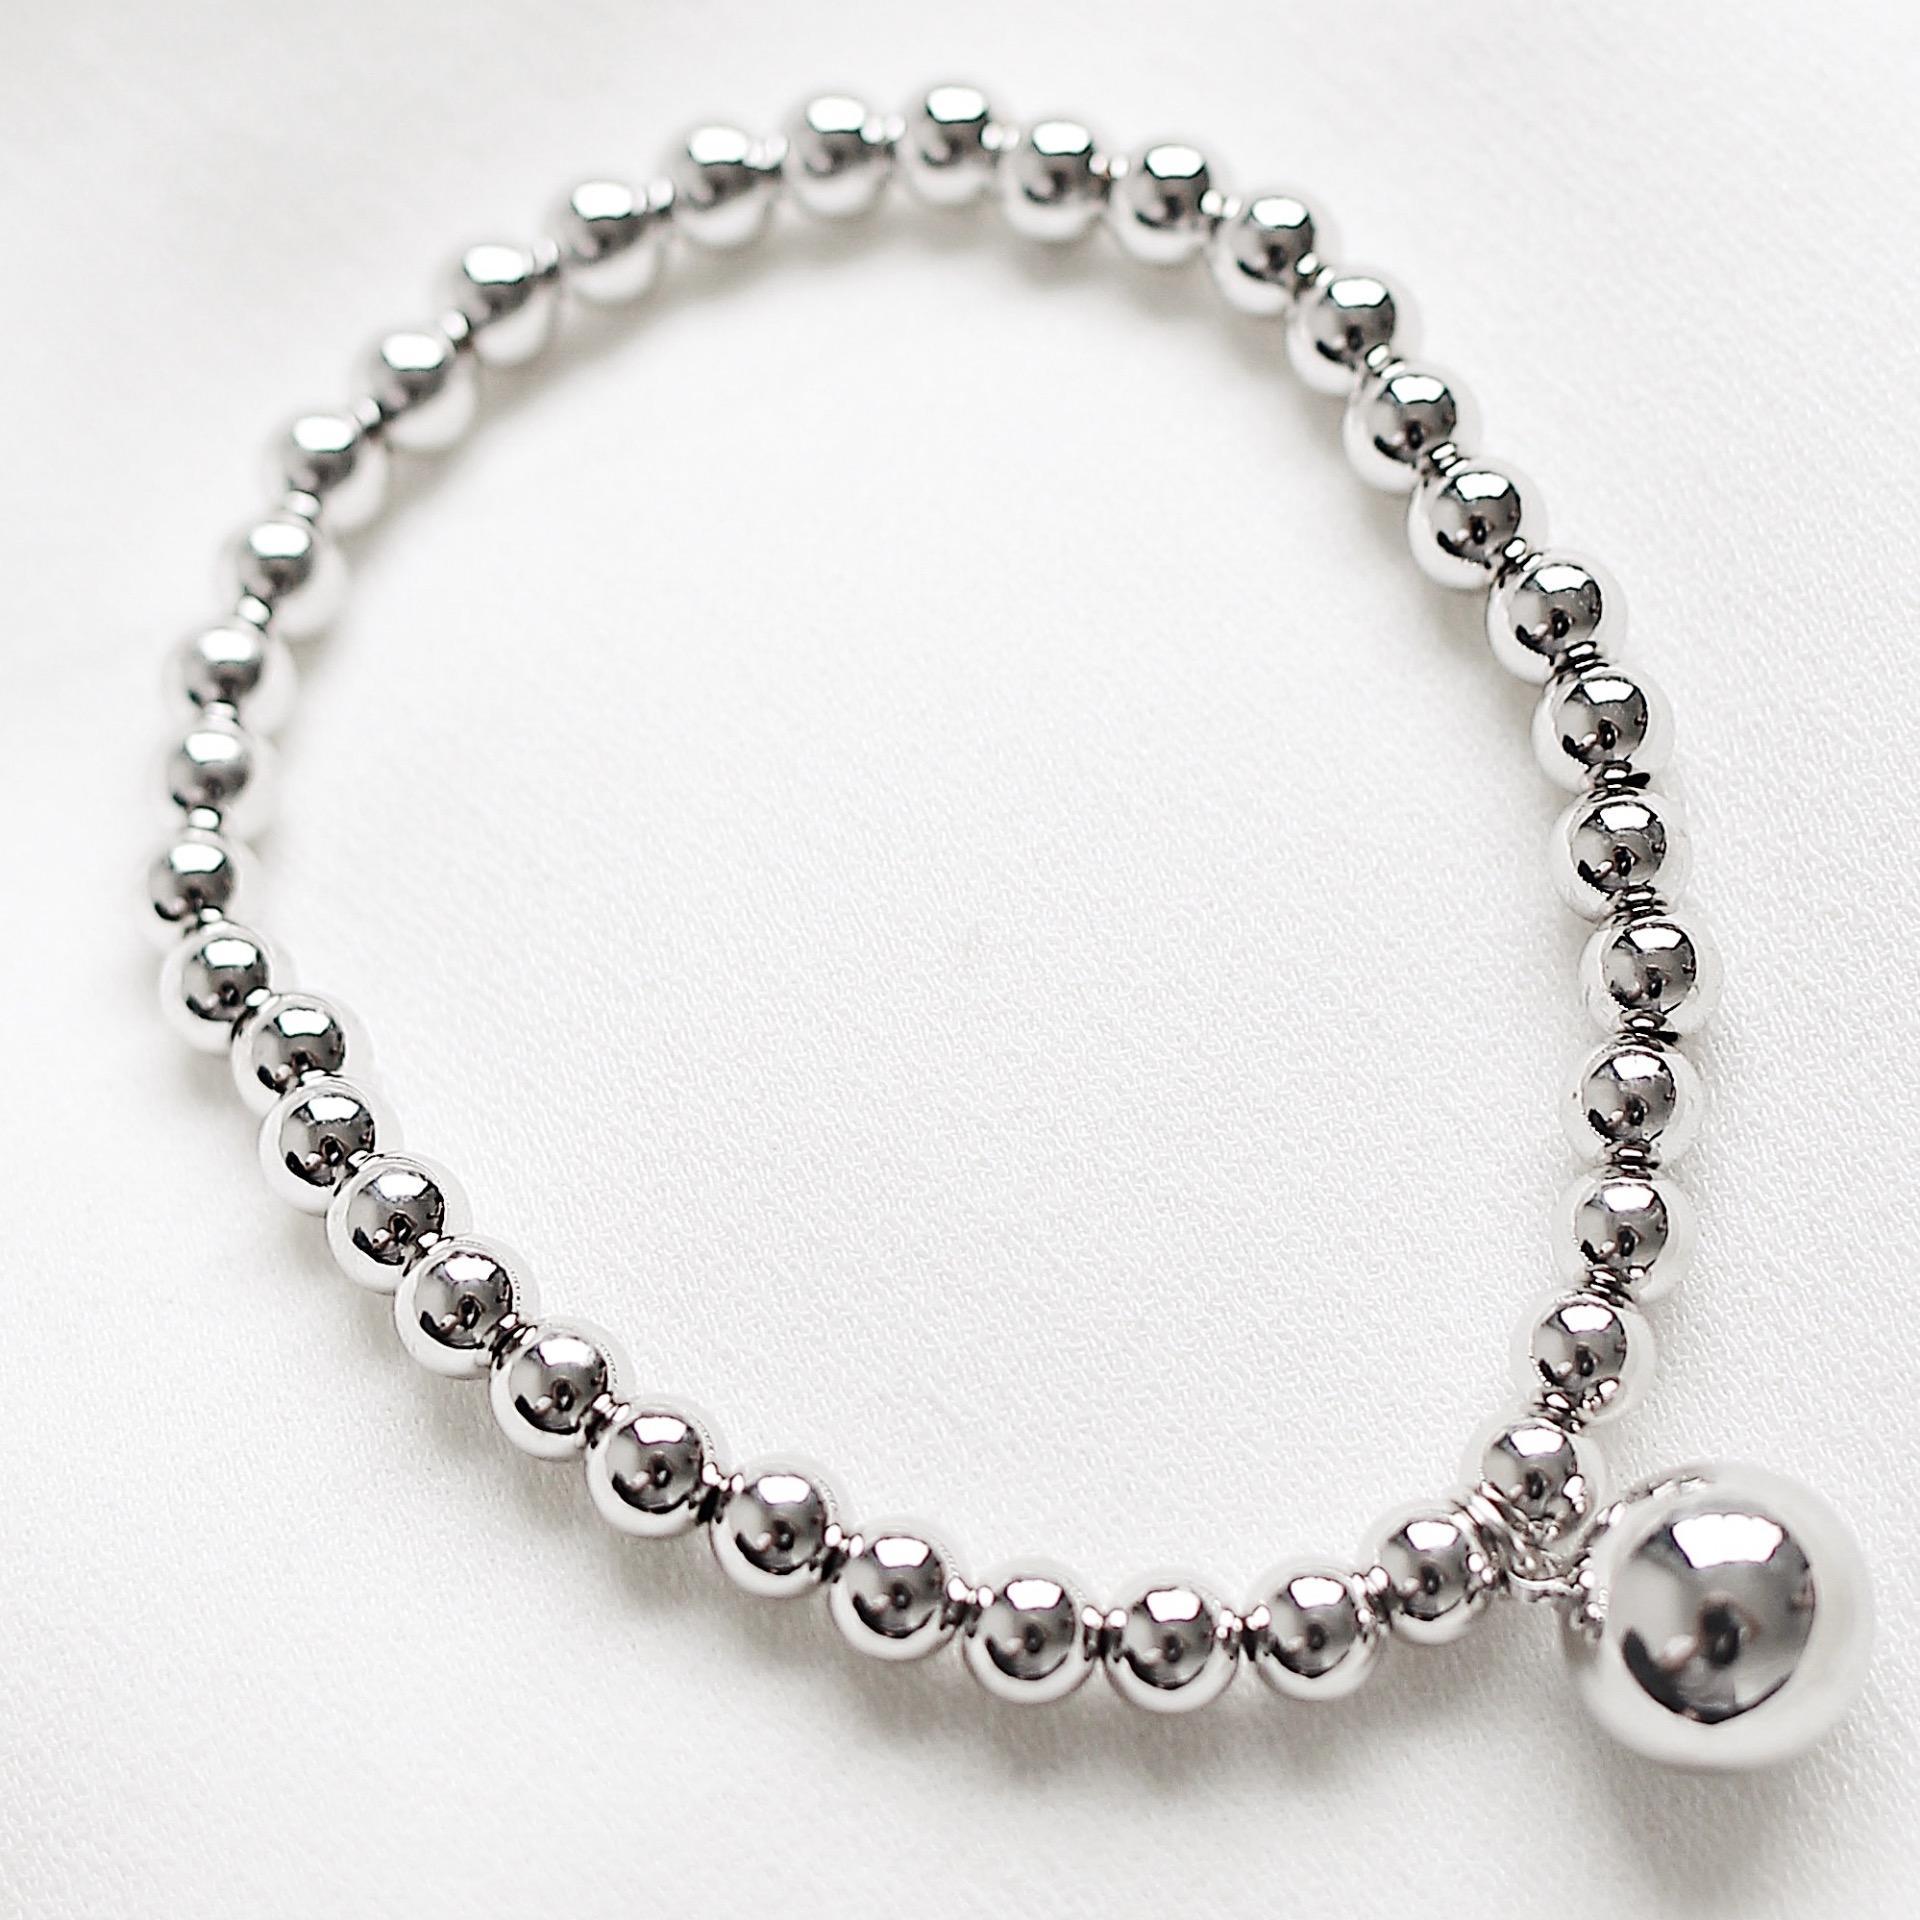 Chiết Khấu Lovesome Bracelets Vietnam